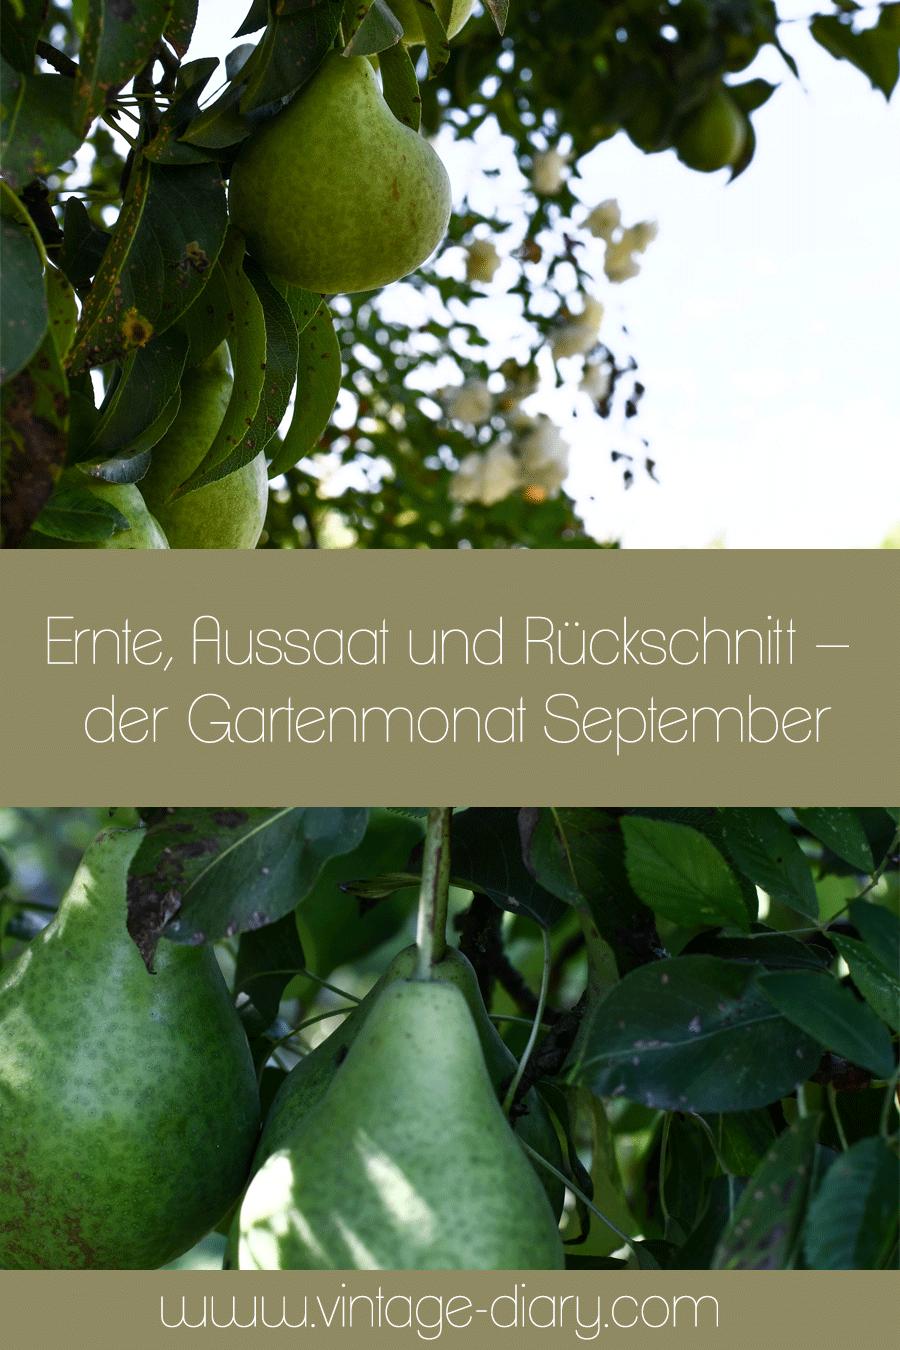 Ernte, Aussaat und Rückschnitt – der Gartenmonat September